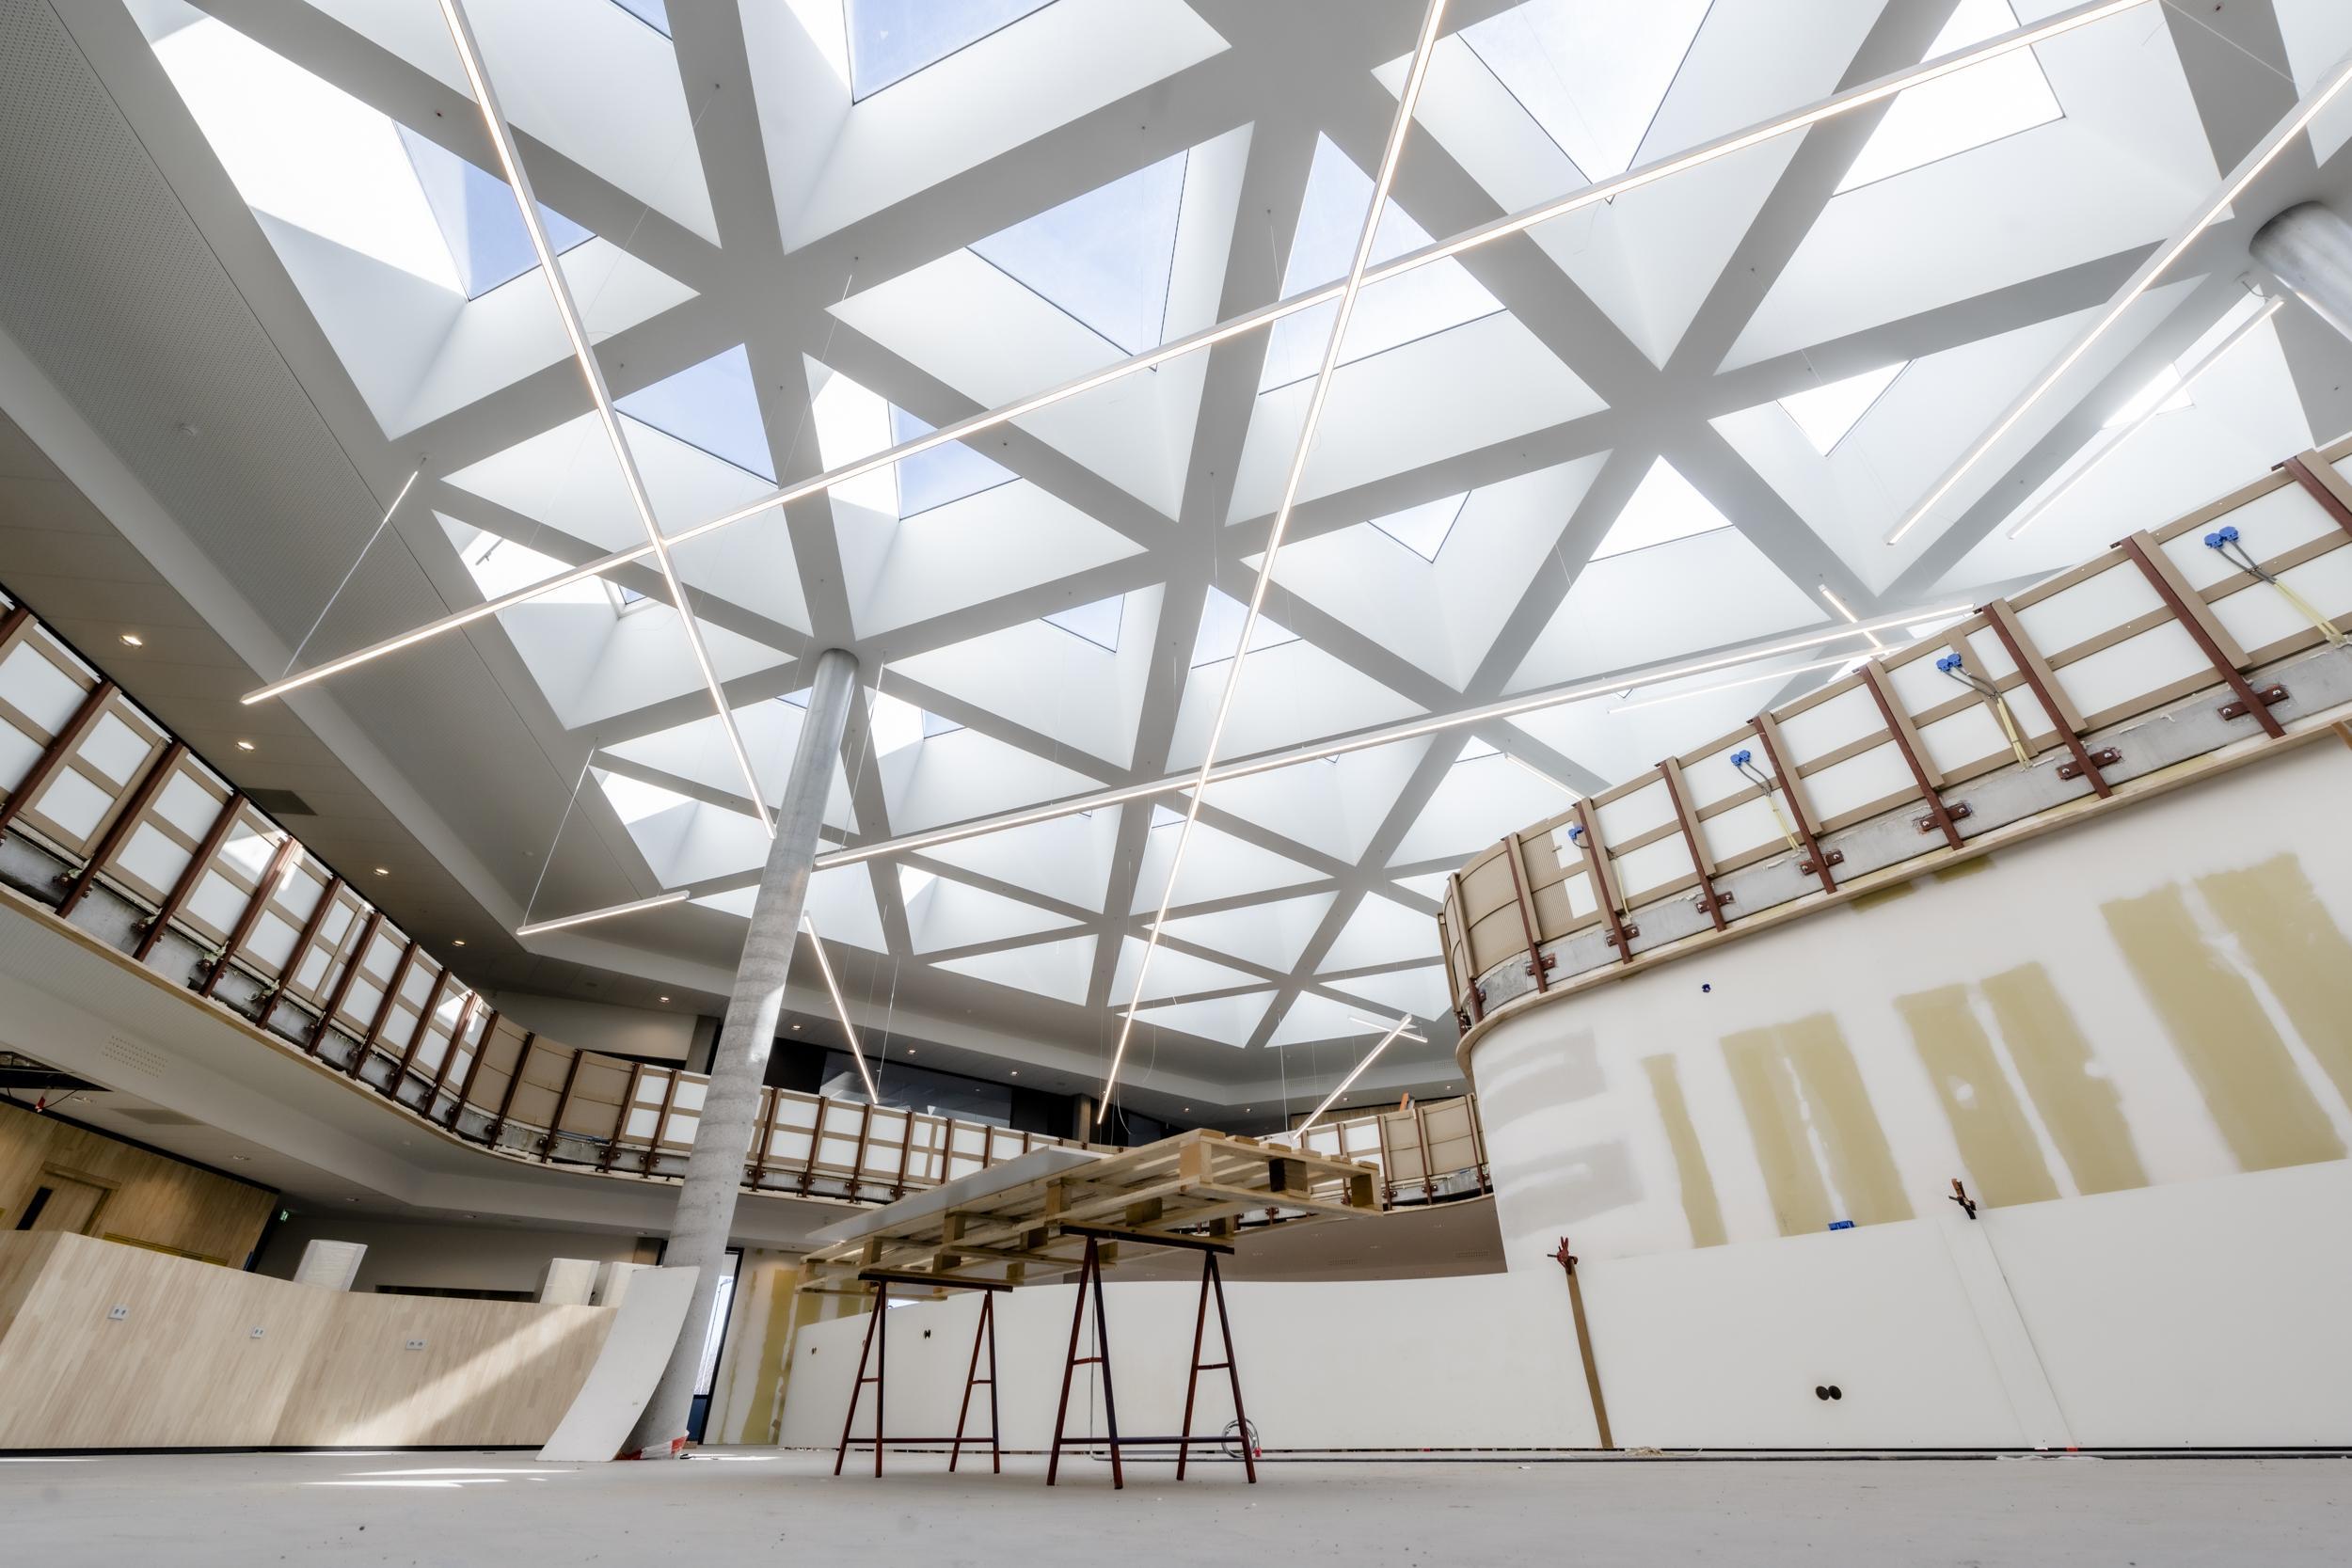 Gemeente Braak - interieur en buiten  30-03-2021-73625